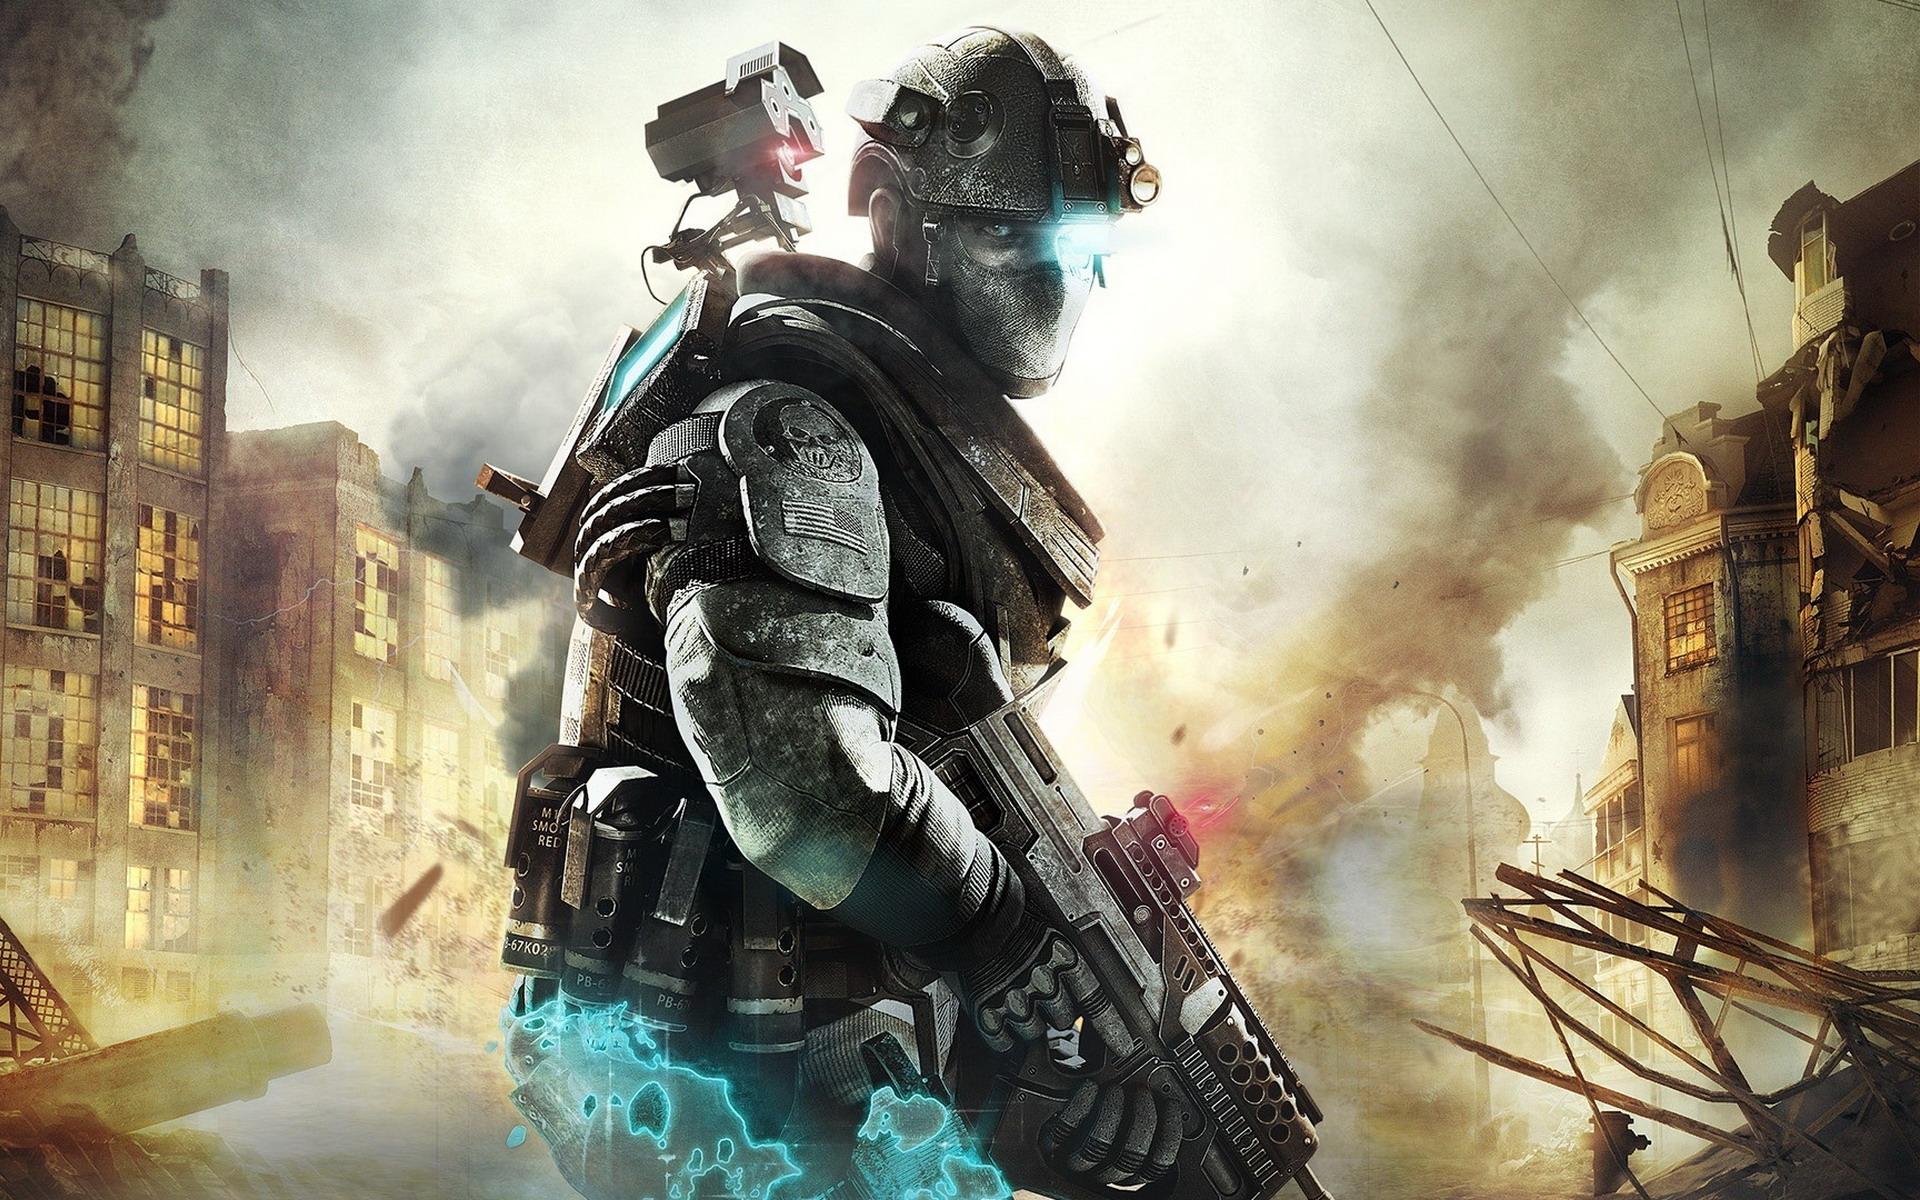 Juegos para PC 2012-2013